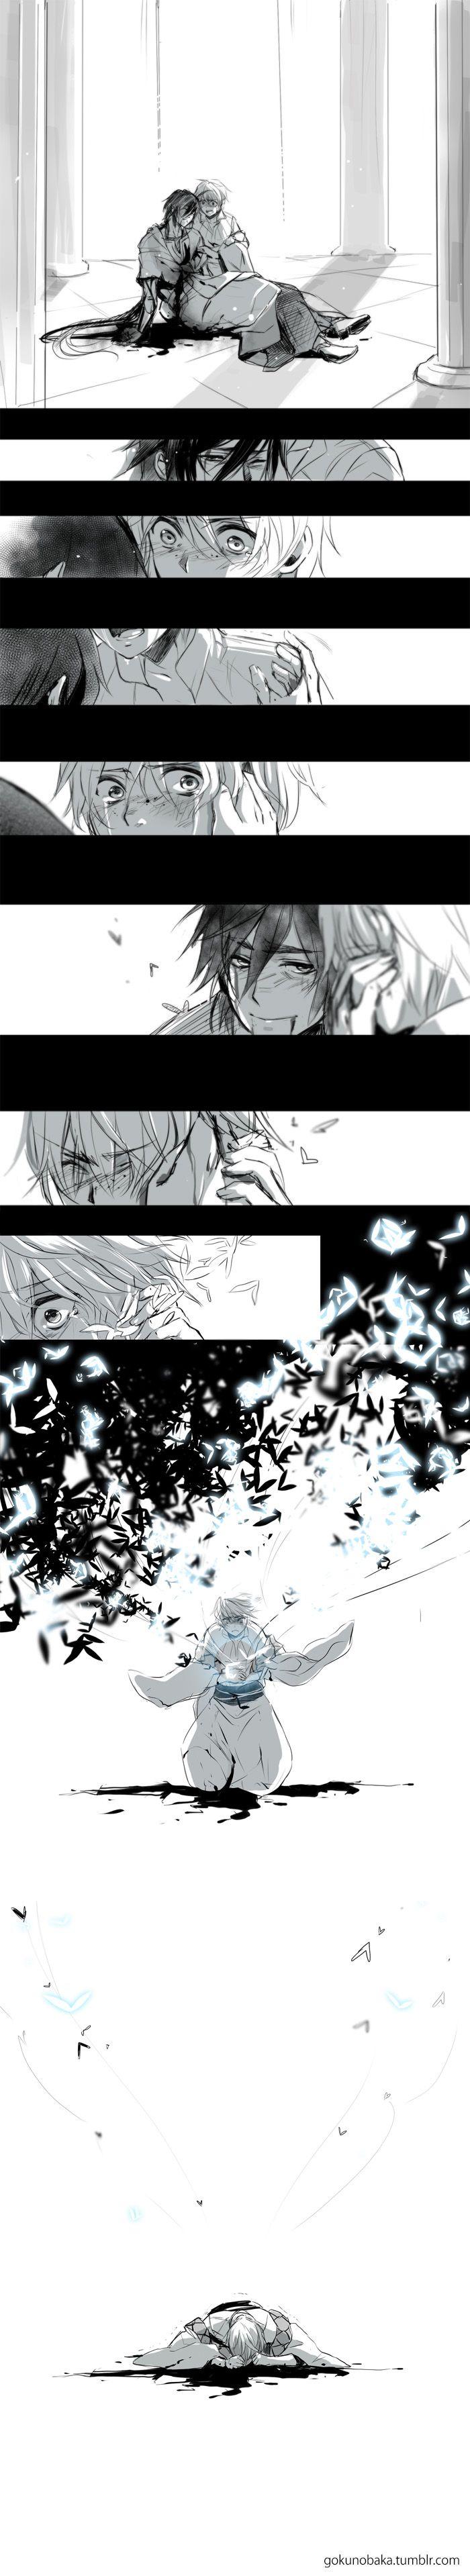 MAGI - finale by *goku-no-baka on deviantART